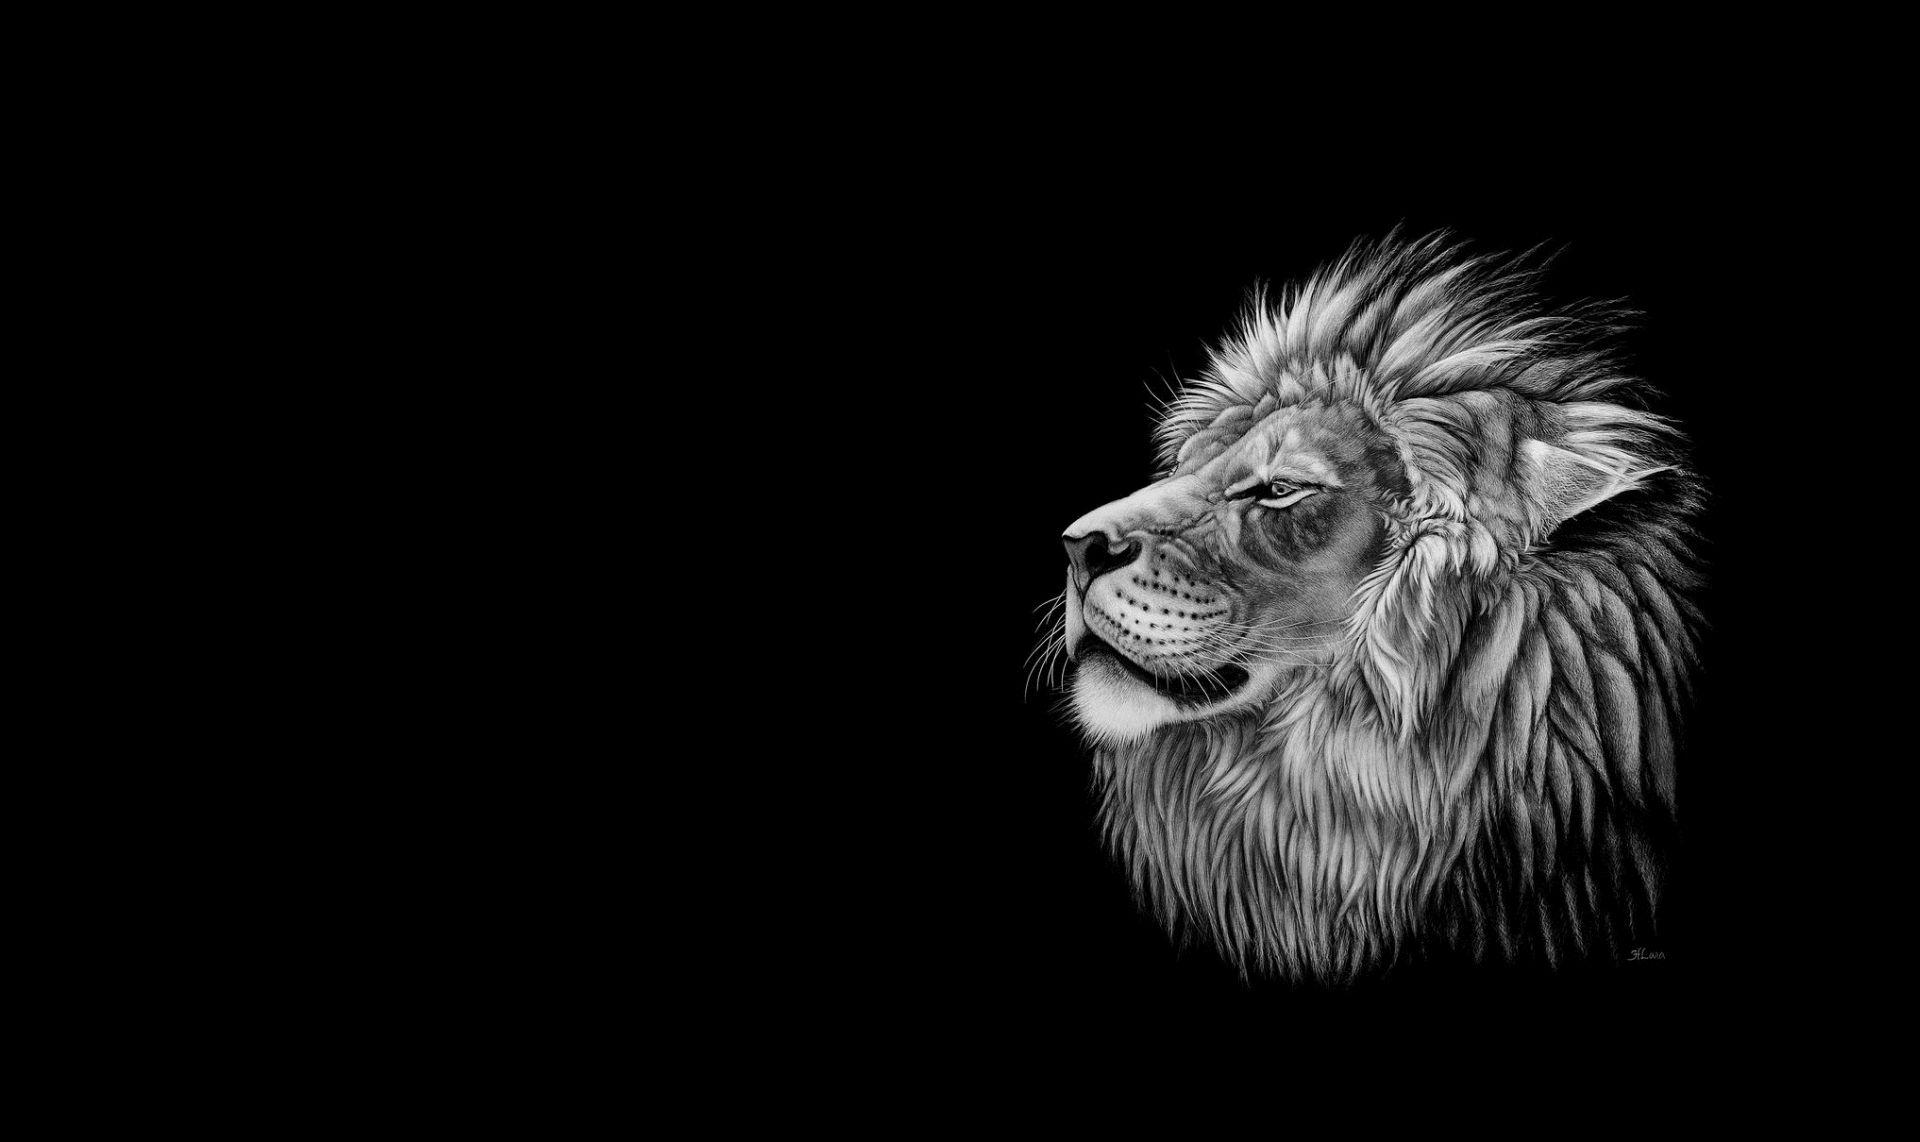 Lion Black And White Animal Good Wallpaper